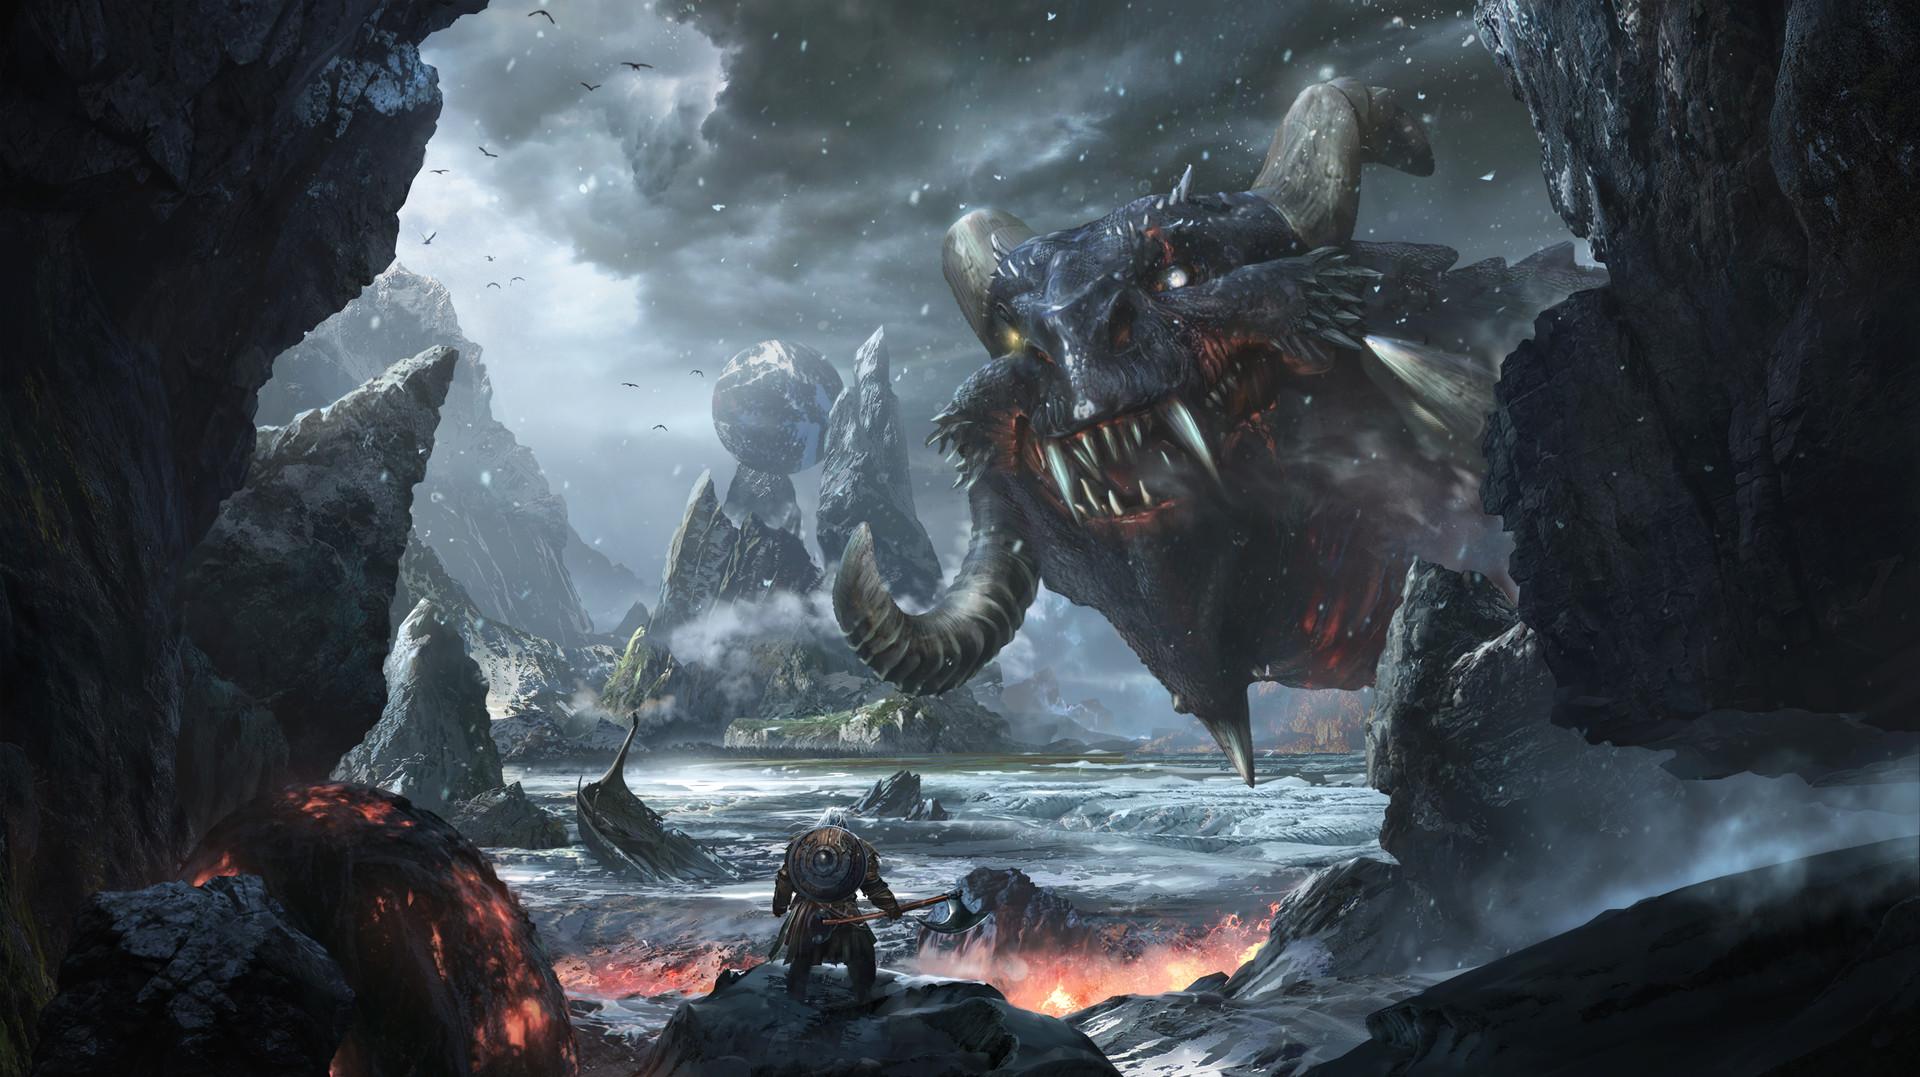 граде картинки викинг и дракон время